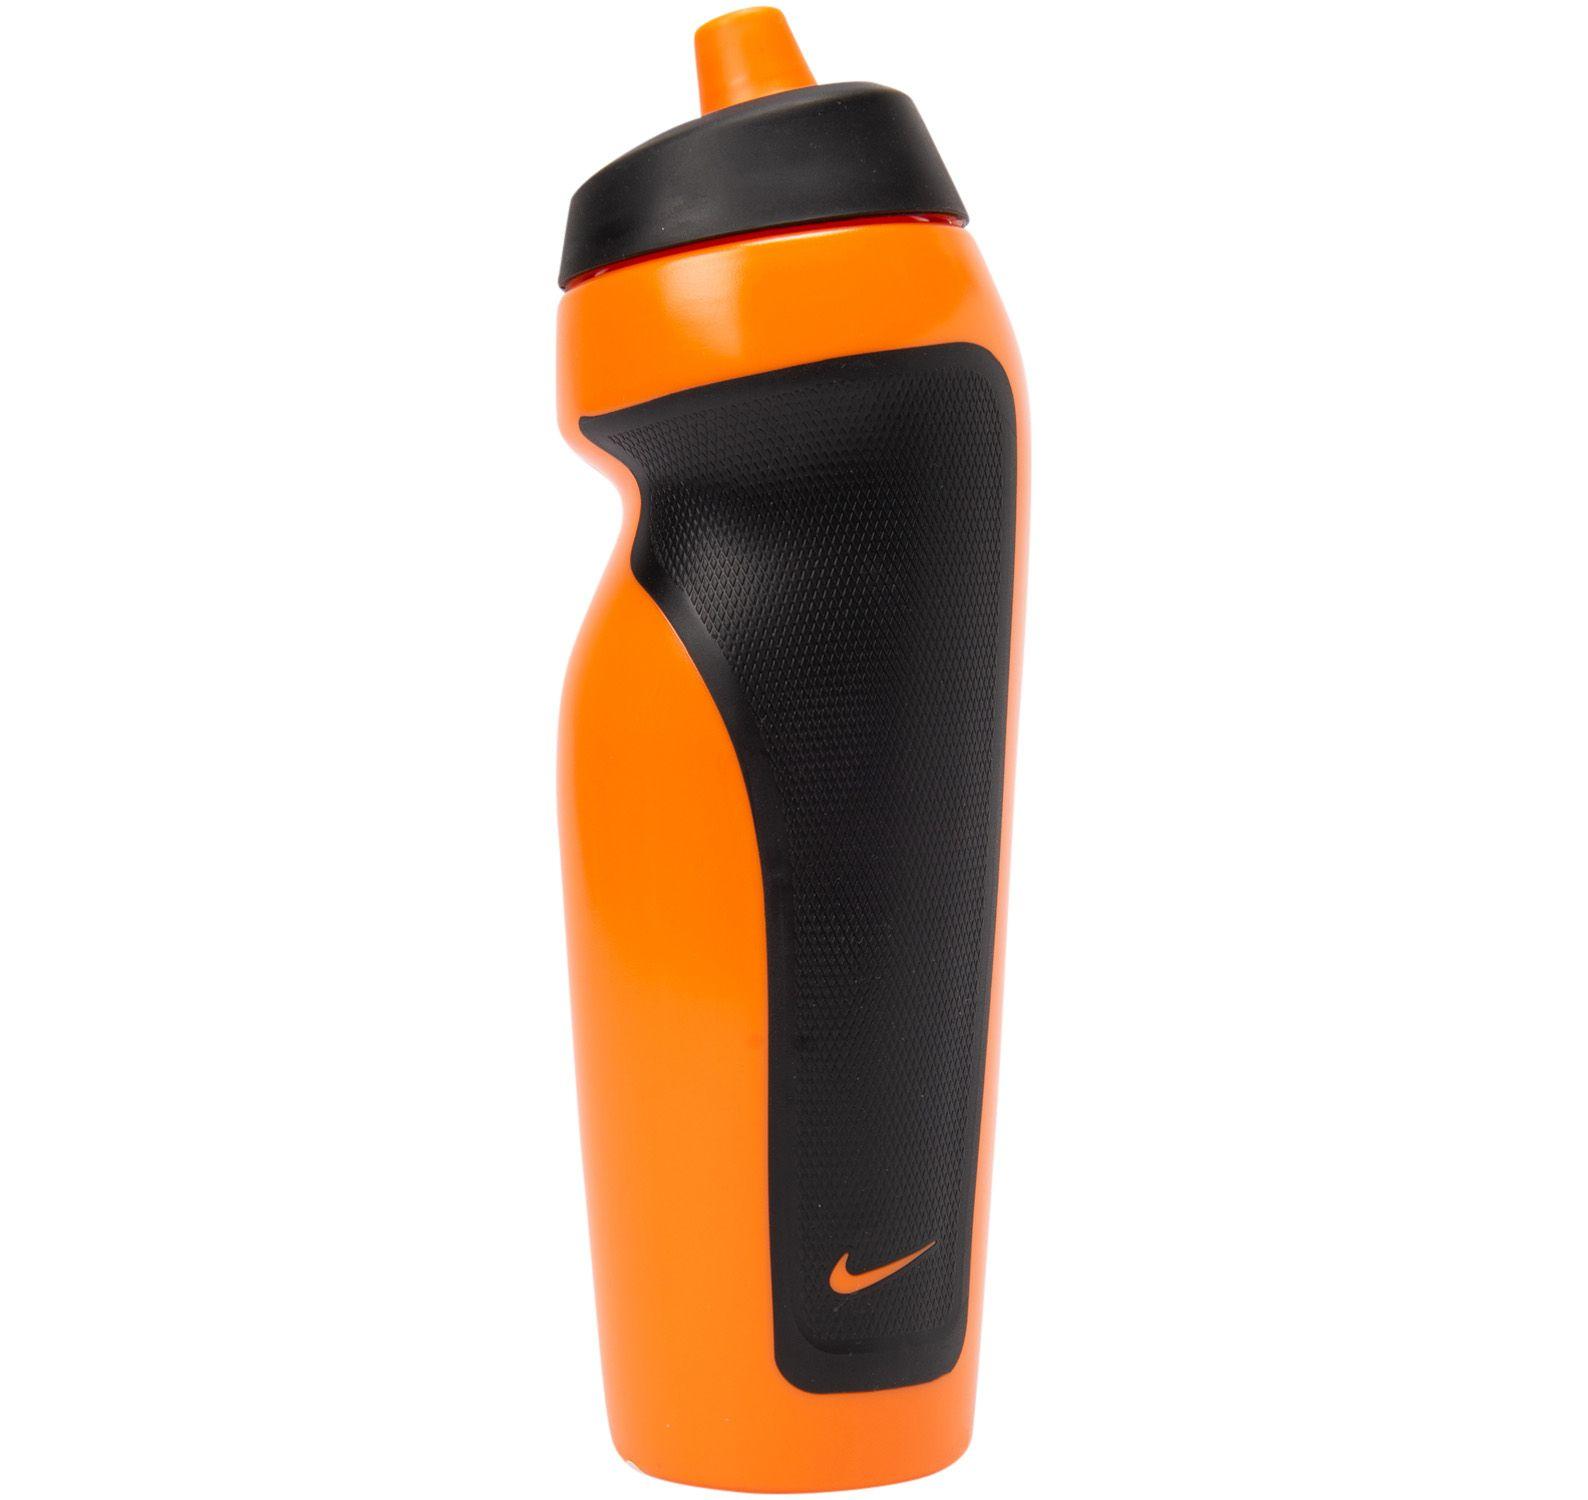 Sport Water Bottle, Bright Mango/Black, Onesize, Nike